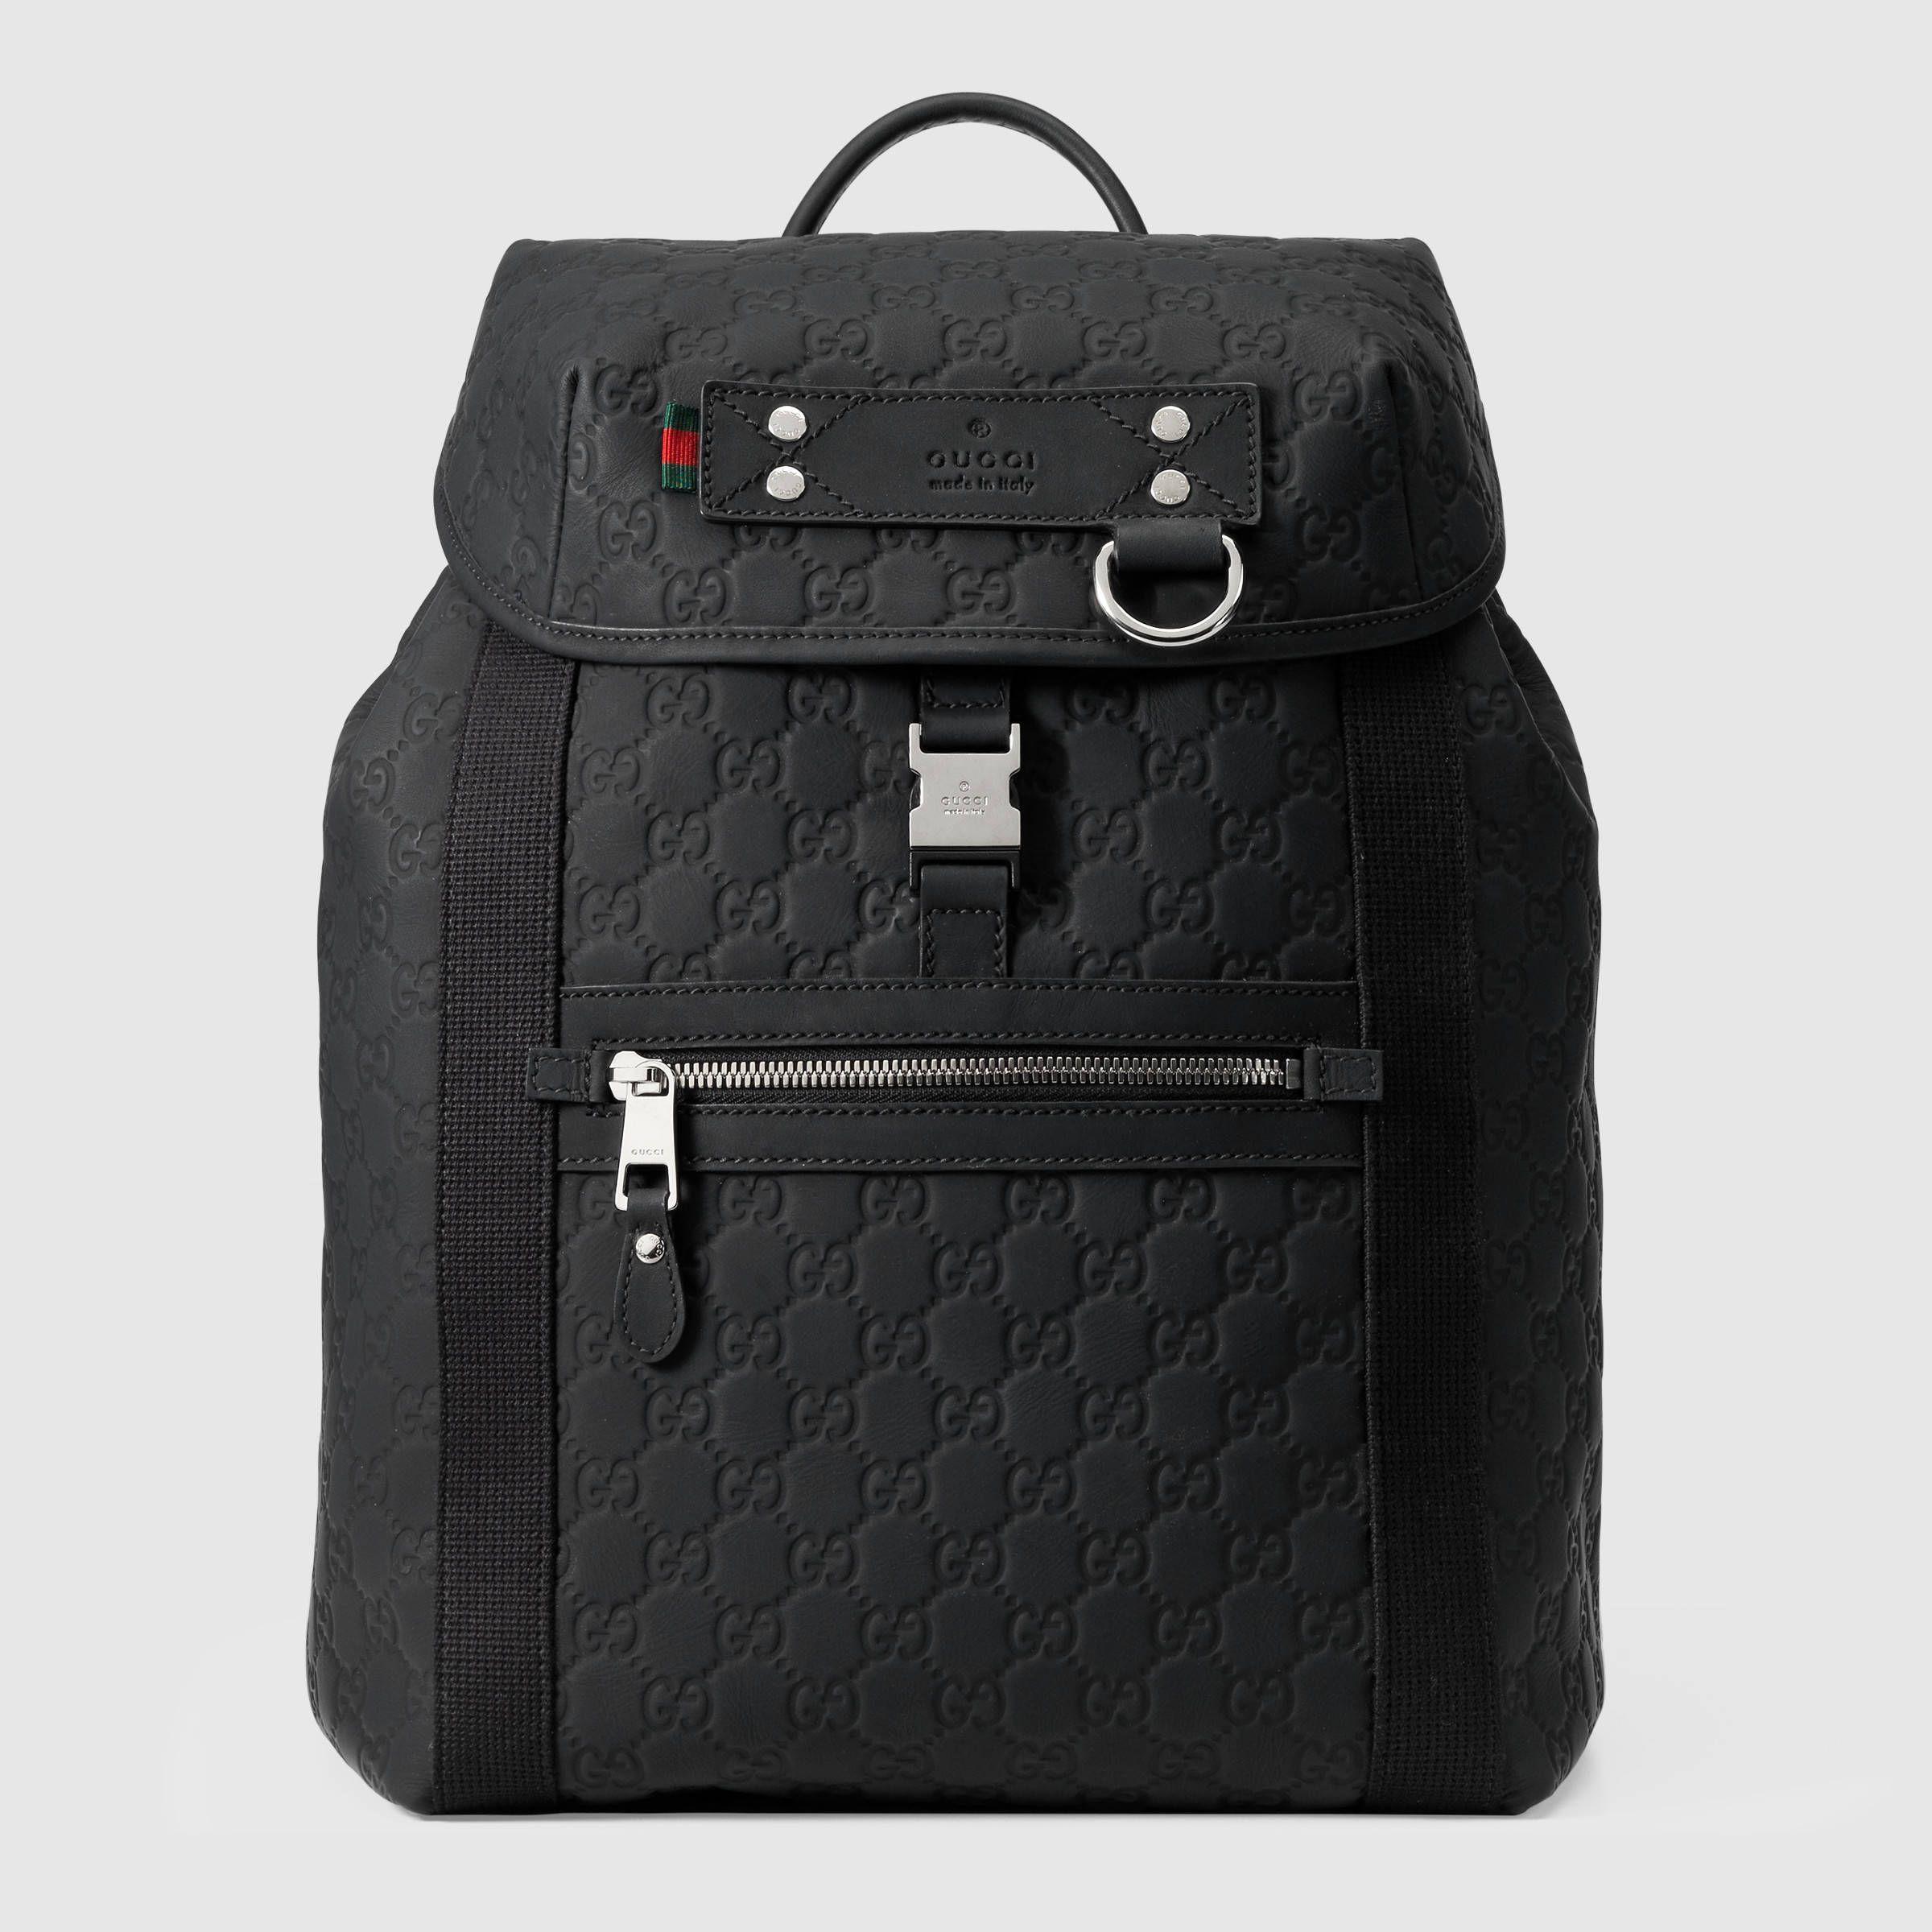 a79bfd803f6 Gucci Guccissima Rubberized Backpack